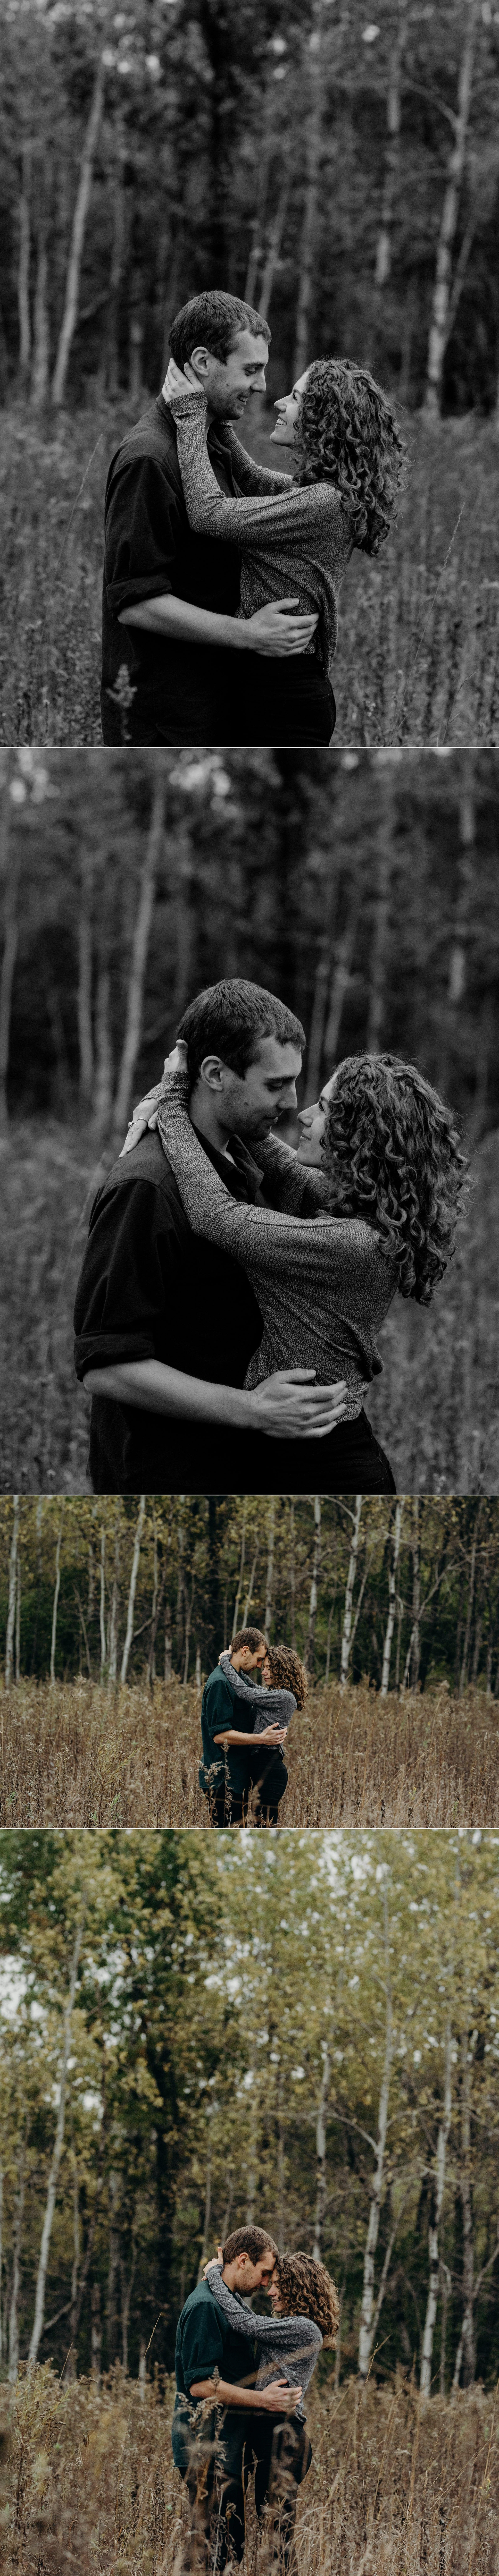 nickmezaphotography-austin-minneapolis-wedding-photographer-elopement-best-intimate-adventurous-destination-texas-minnesota-engagement-jess-dan-spacesaver_0178.jpg